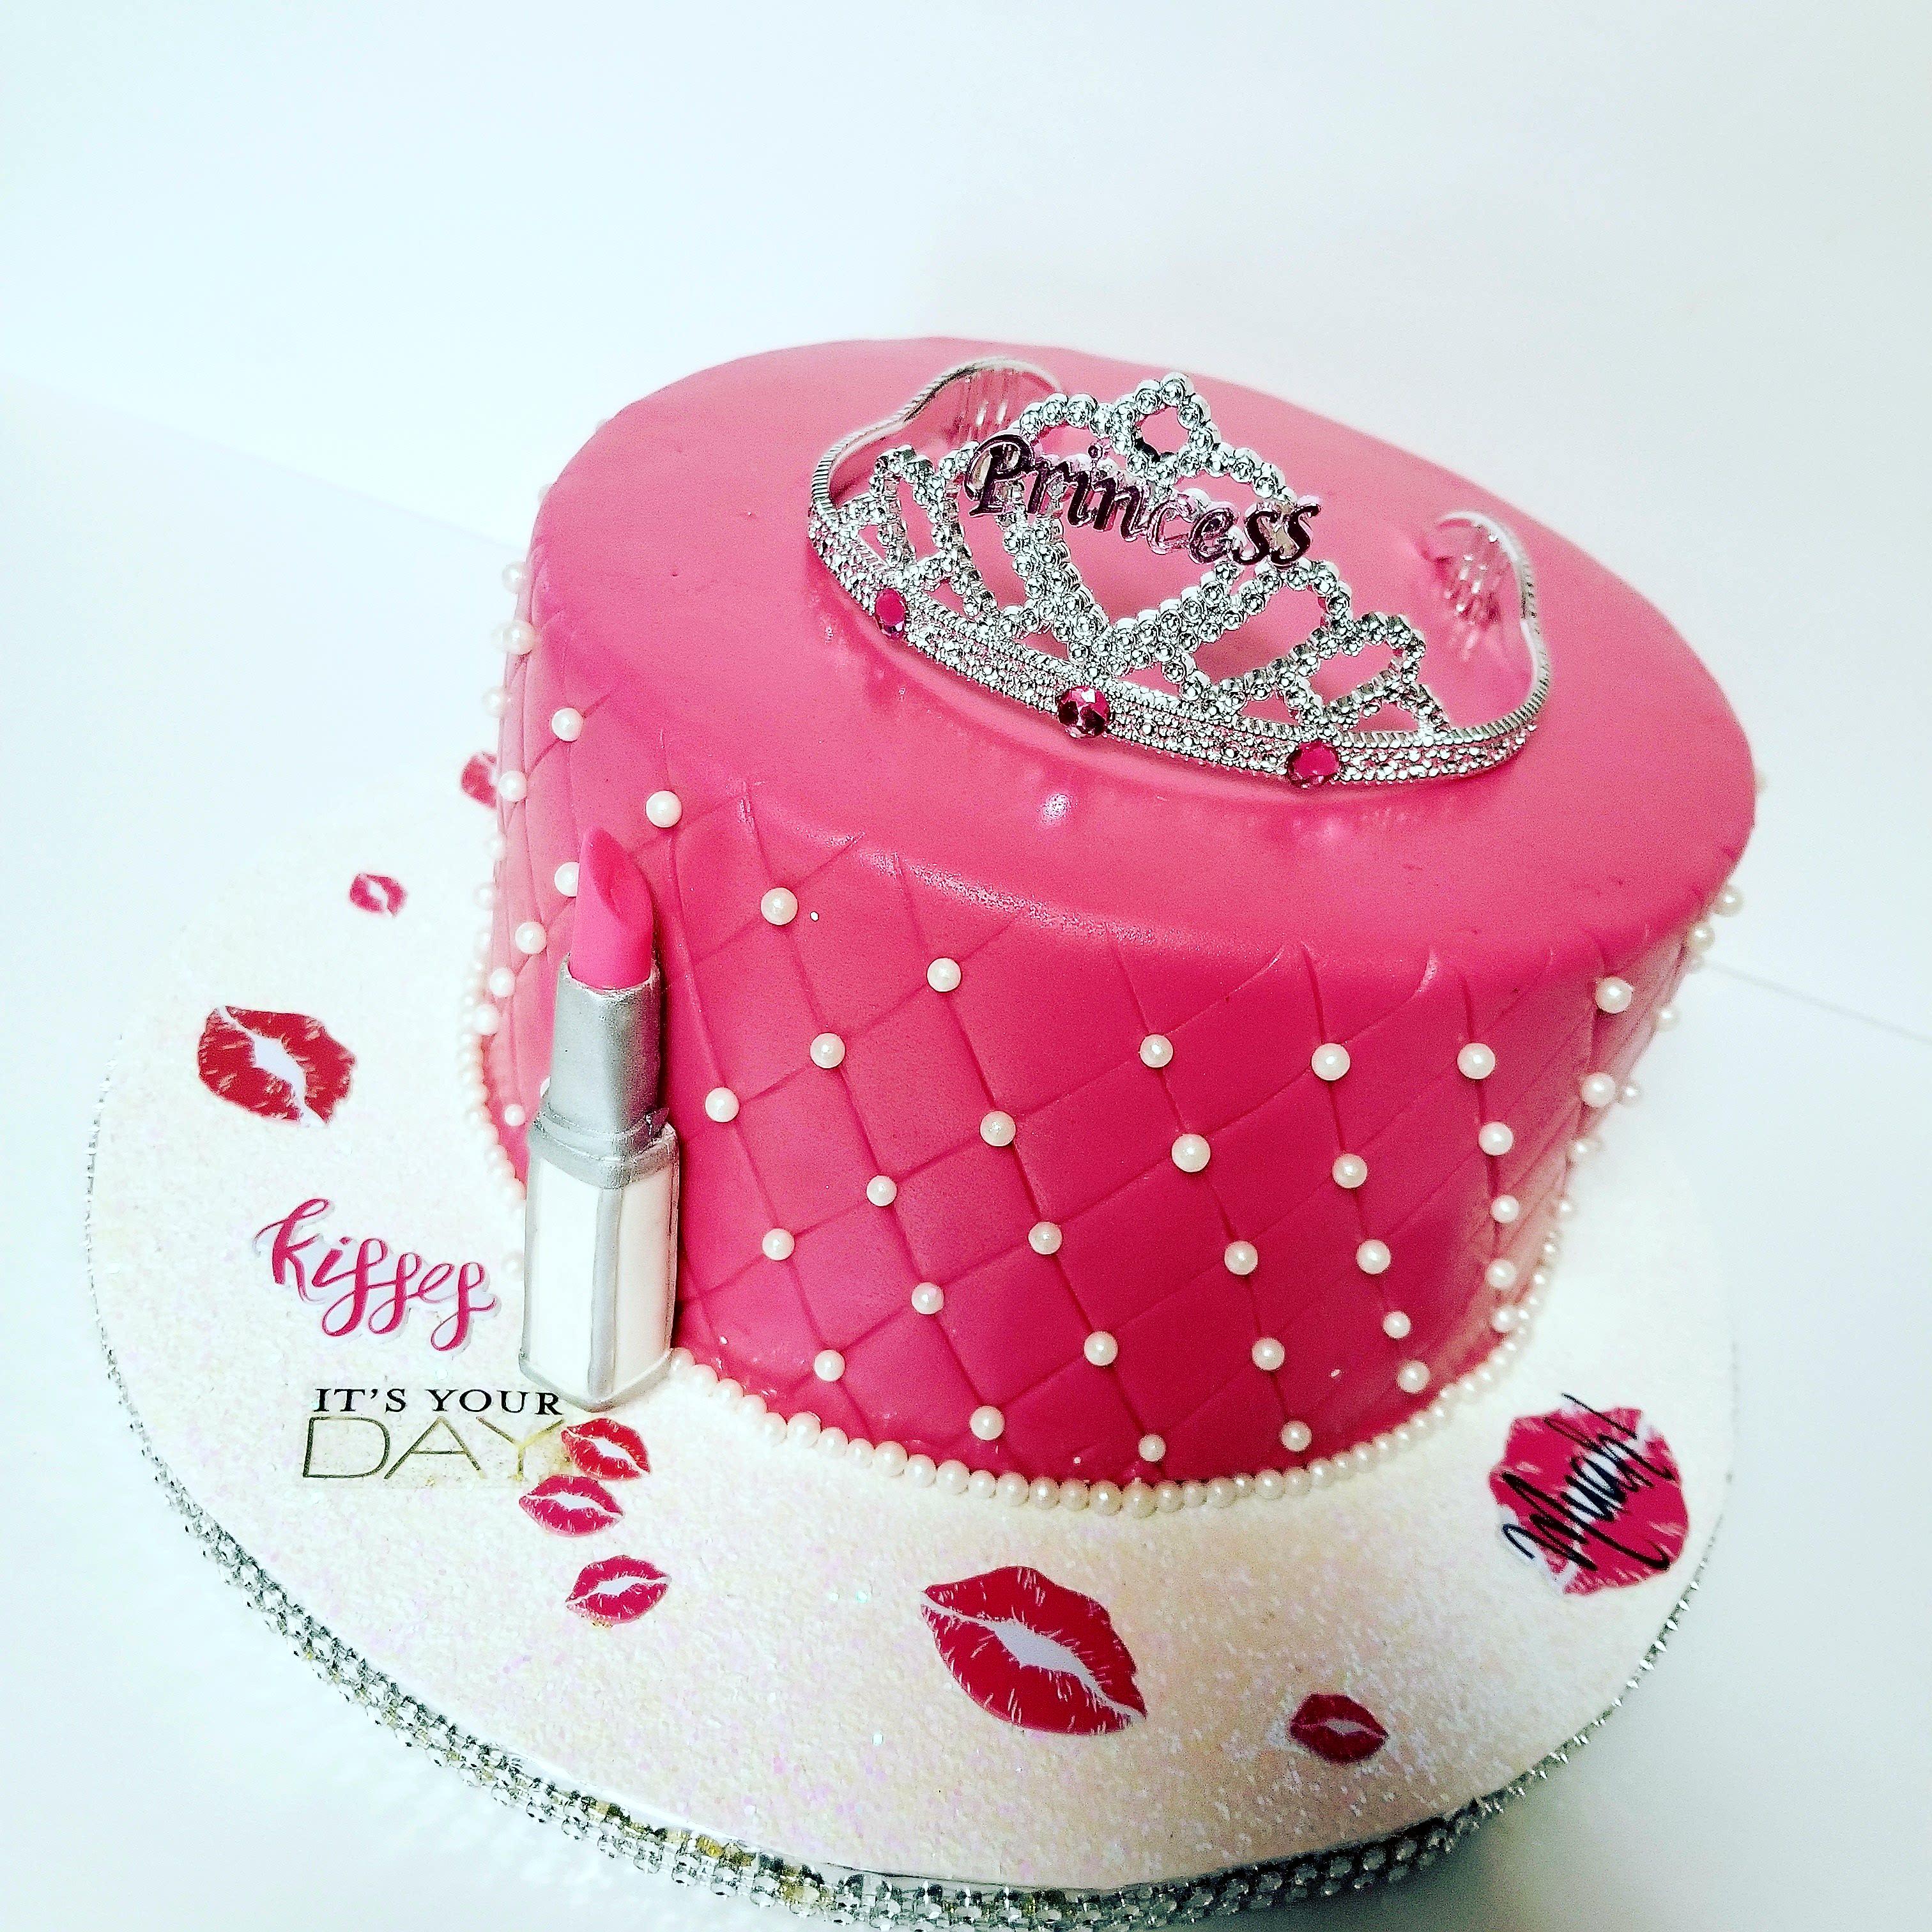 Kisses to you Princess on your Birthday!